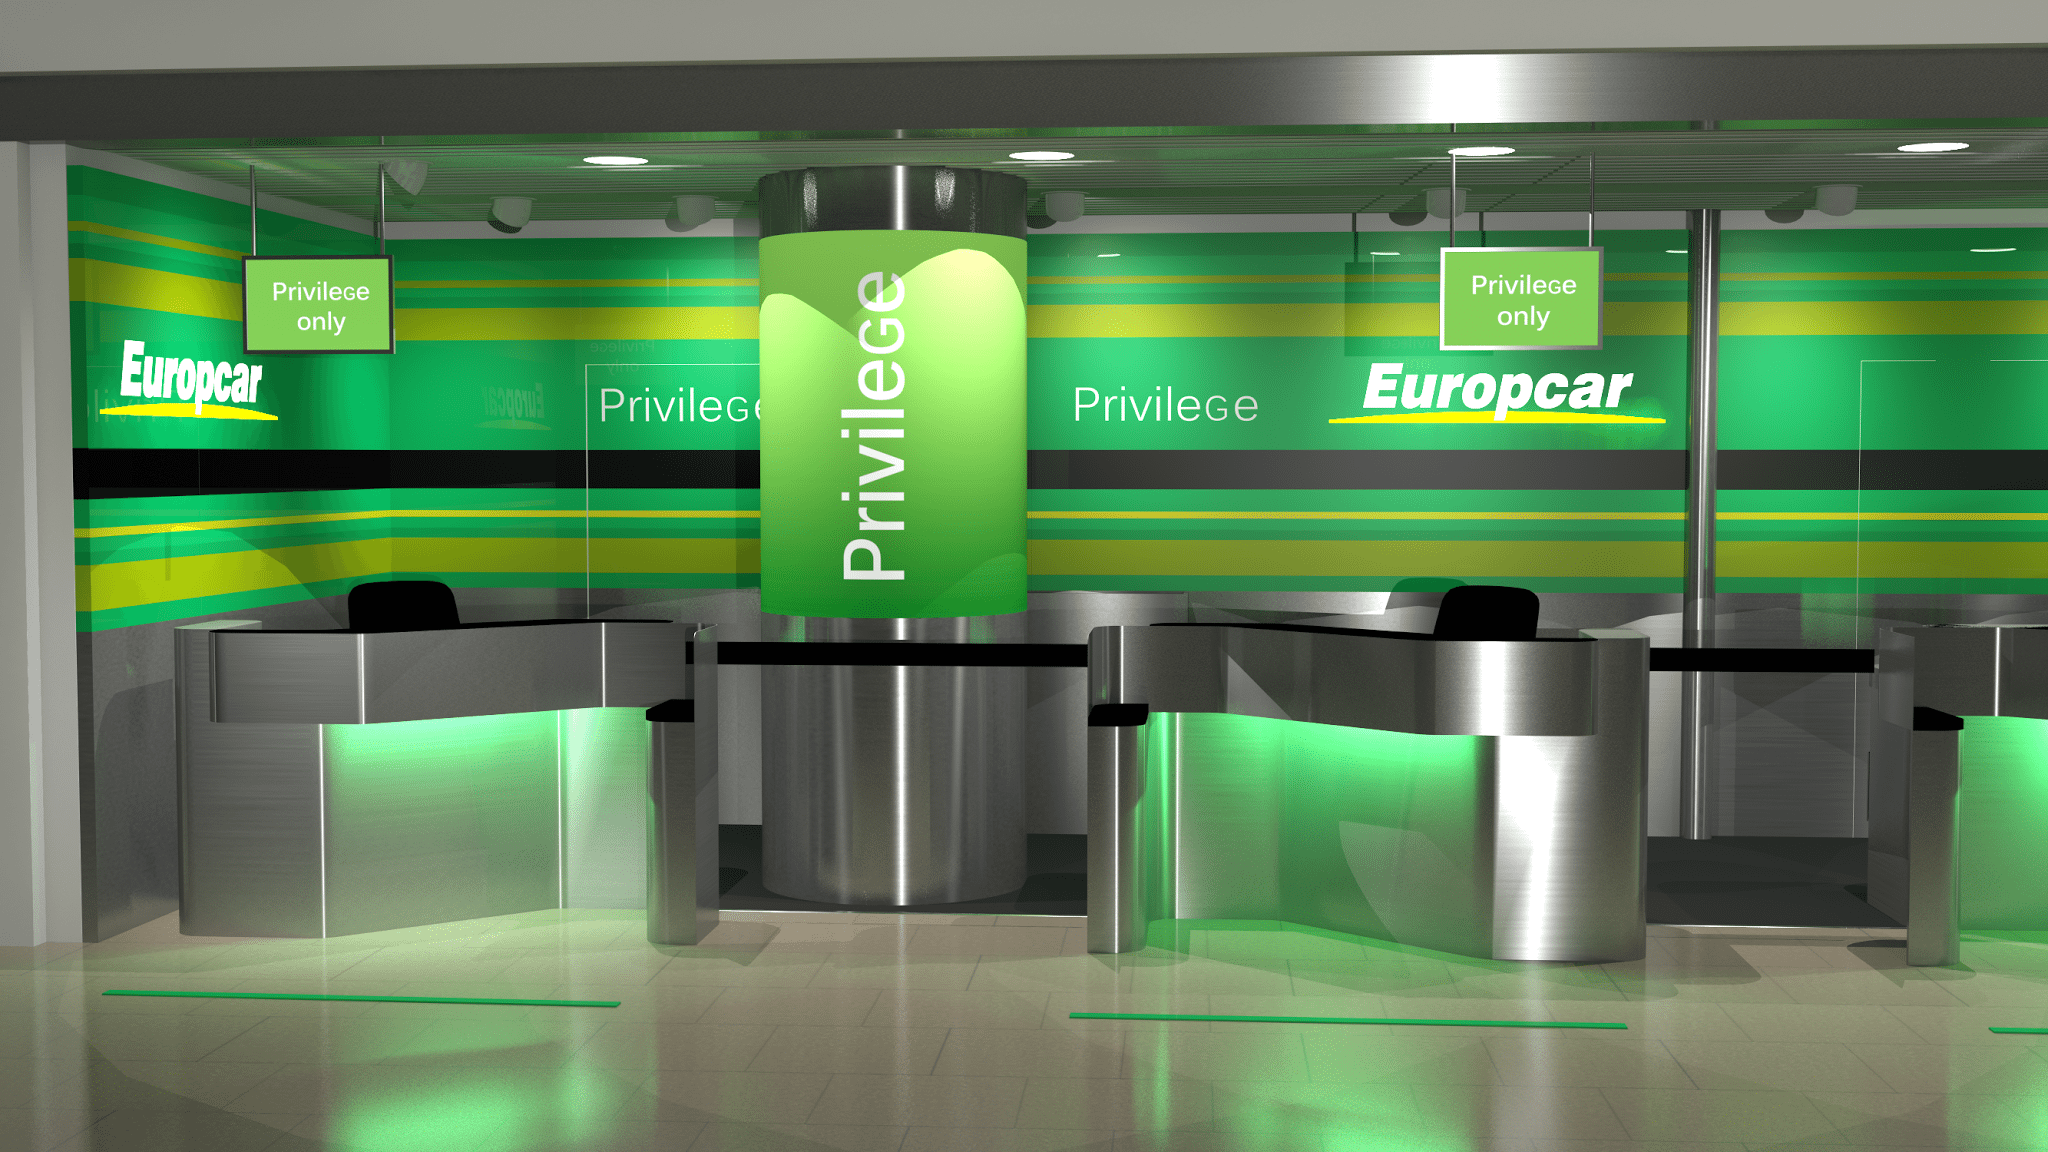 Europcar Privilege